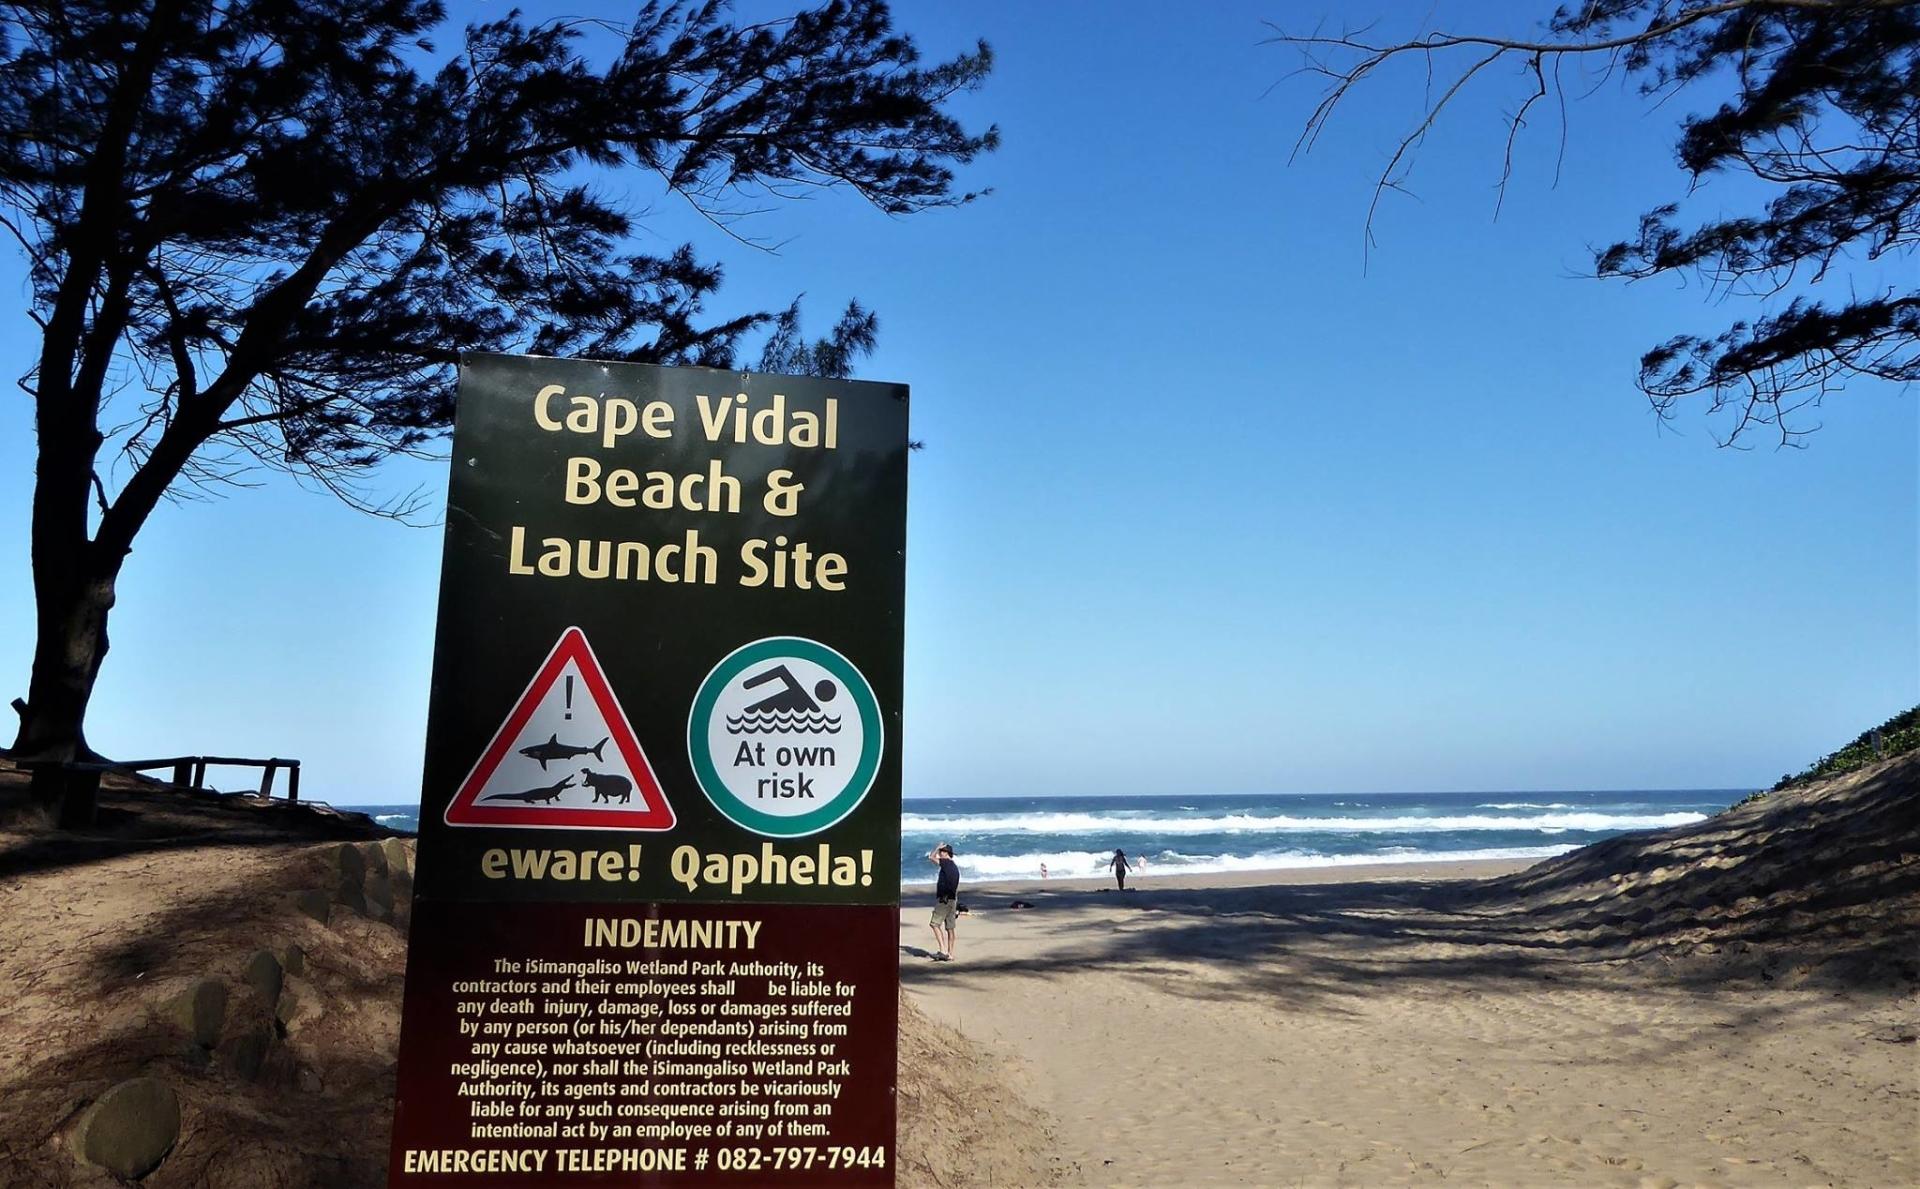 St. Lucia Zuid-Afrika Cape Vidal Beach